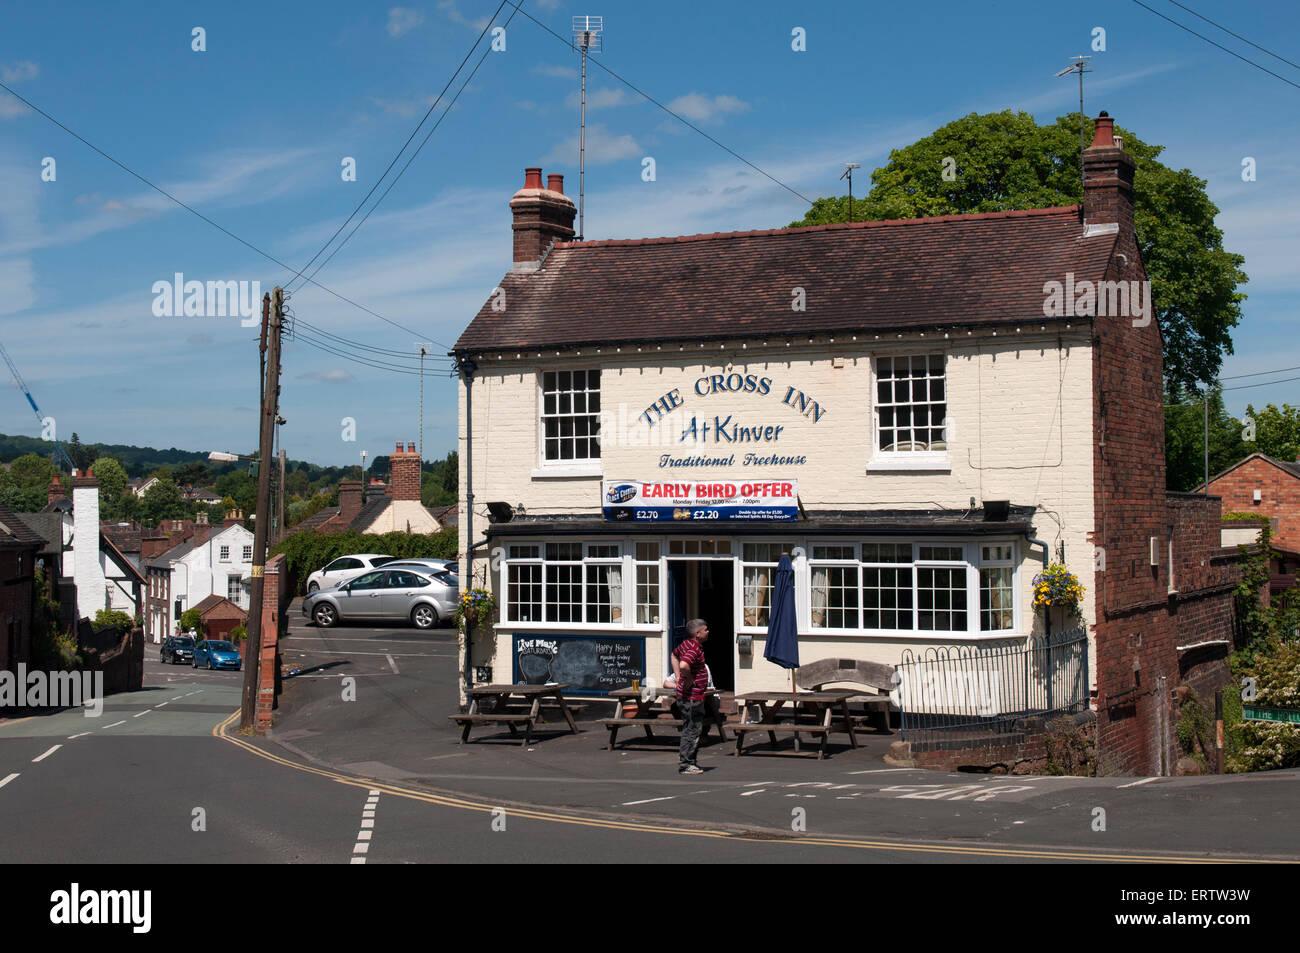 The Cross Inn, Kinver, Staffordshire, England, UK - Stock Image